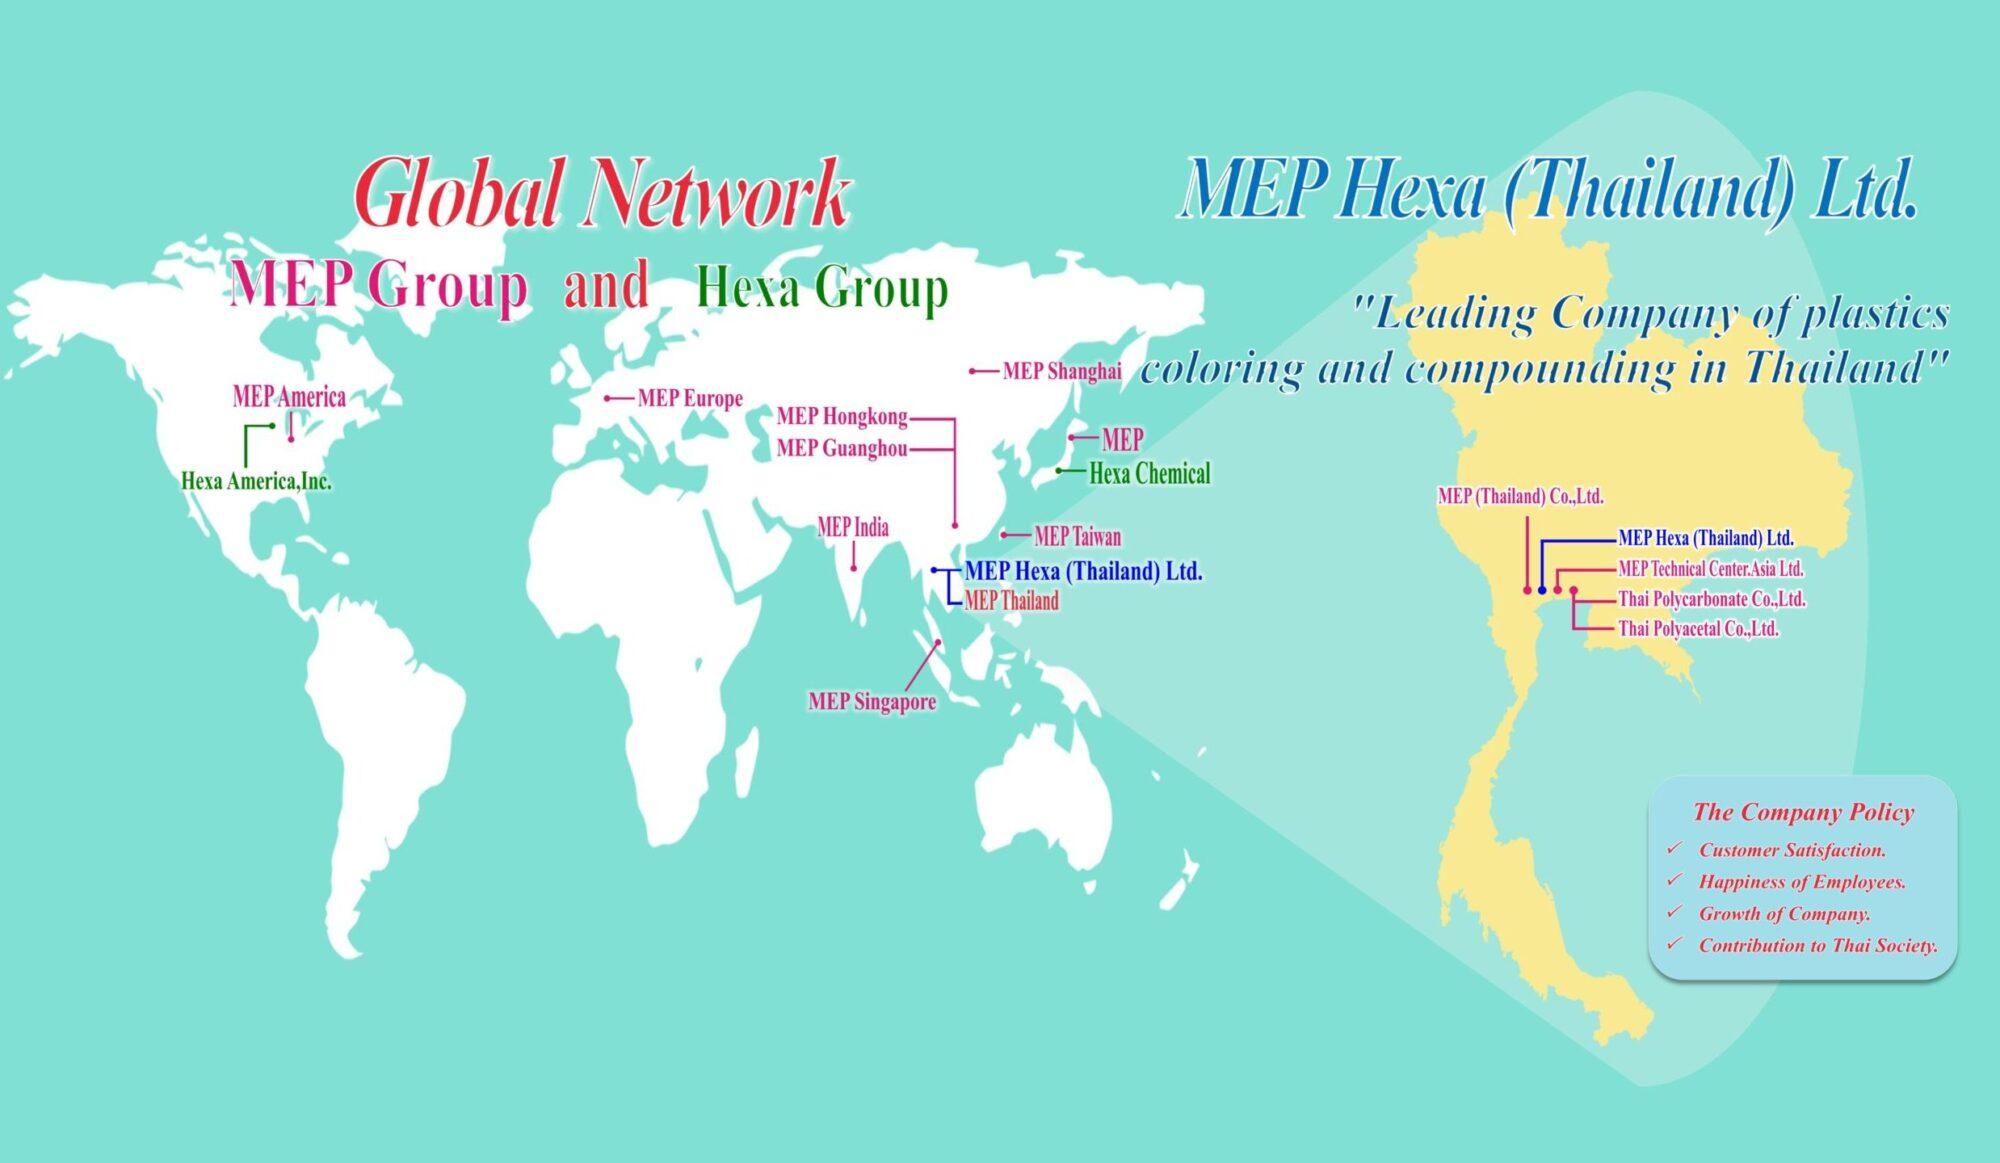 Map Global Network rev.1